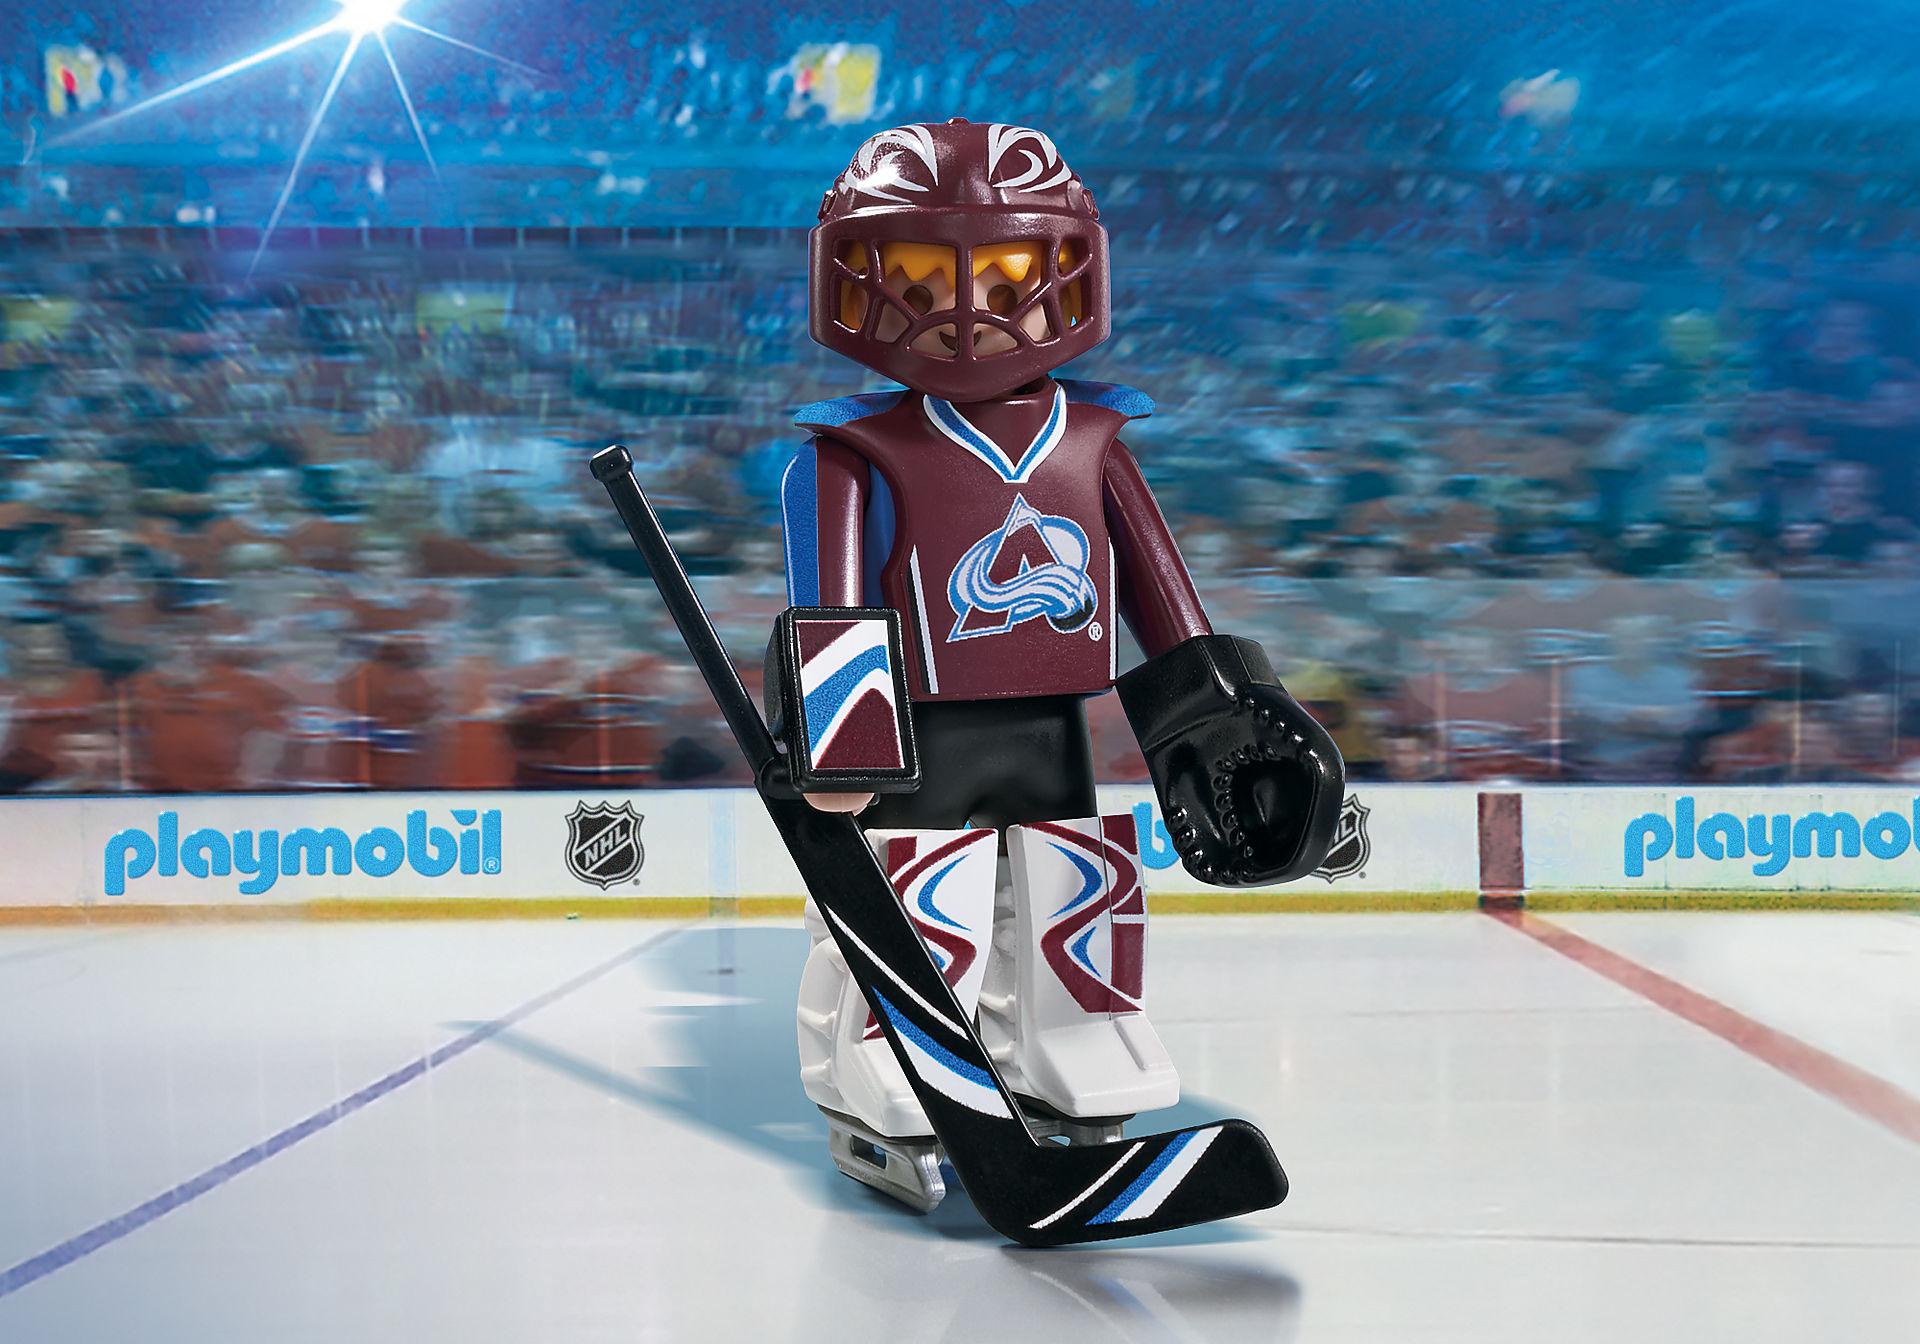 http://media.playmobil.com/i/playmobil/9189_product_detail/NHL® Colorado Avalanche® Goalie